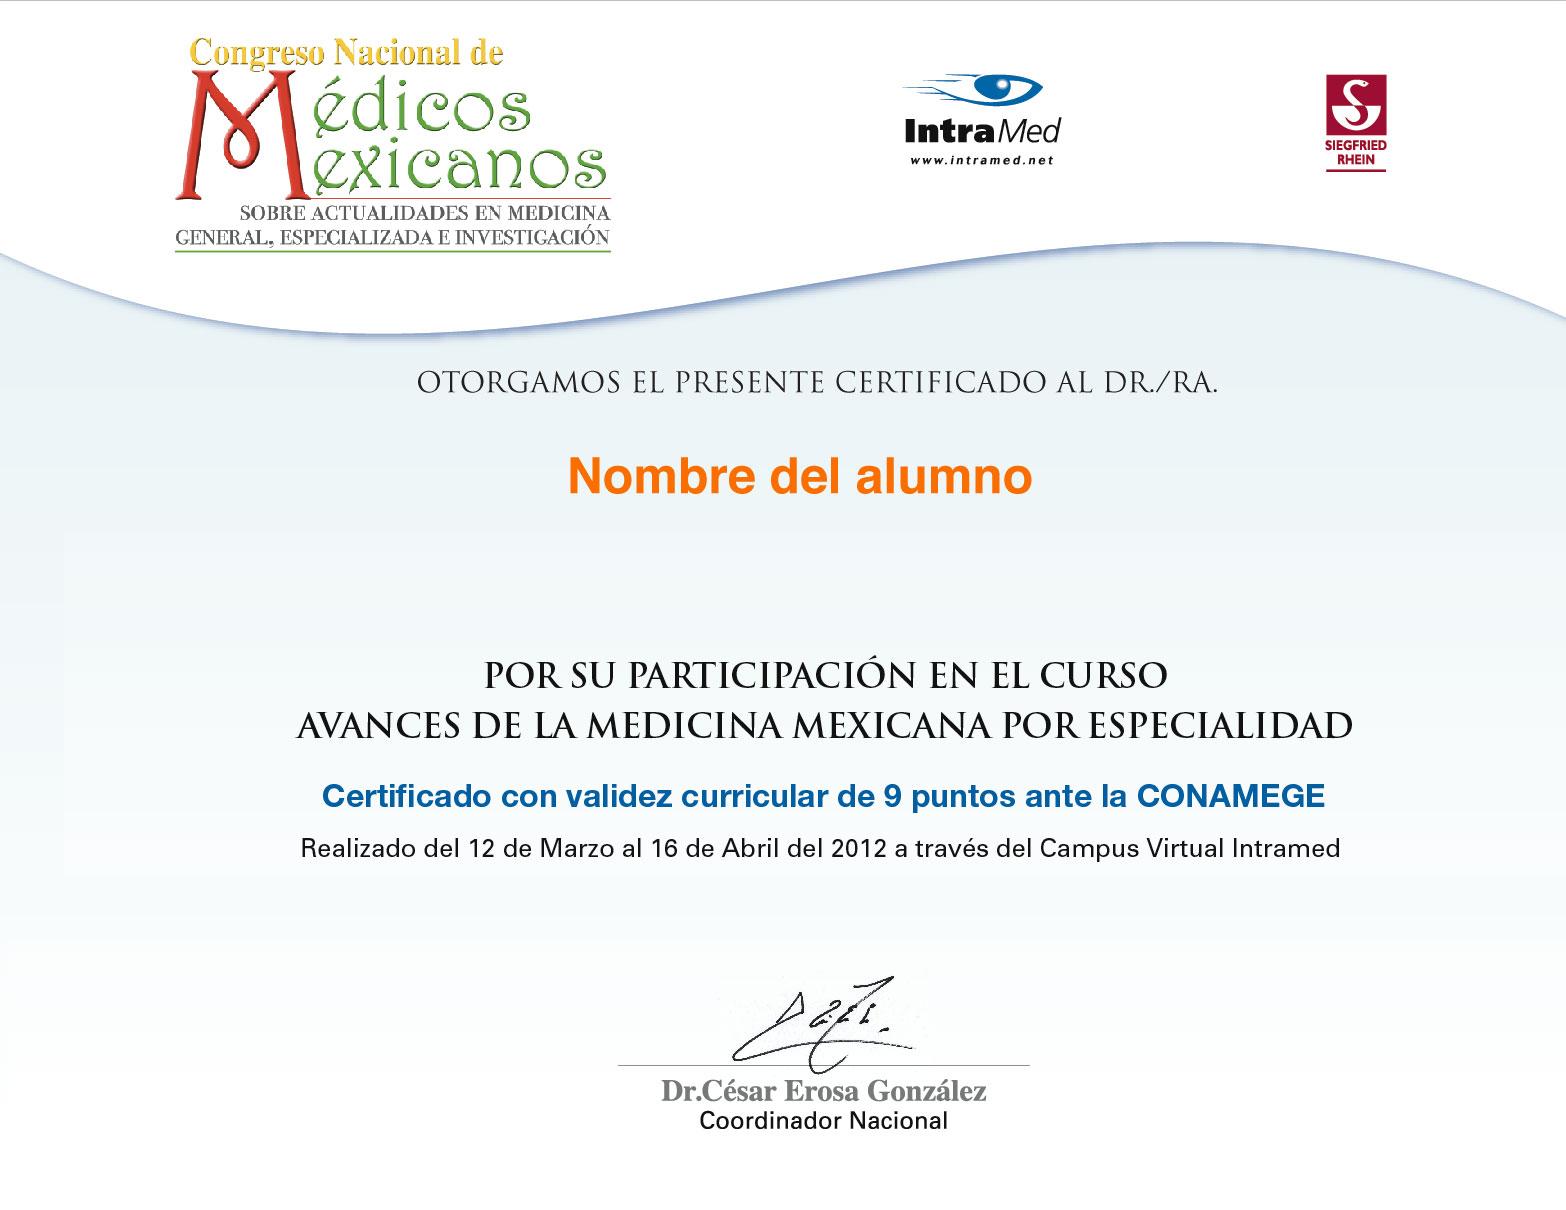 Congreso Nacional de Médicos Mexicanos - IntraMed - Eventos